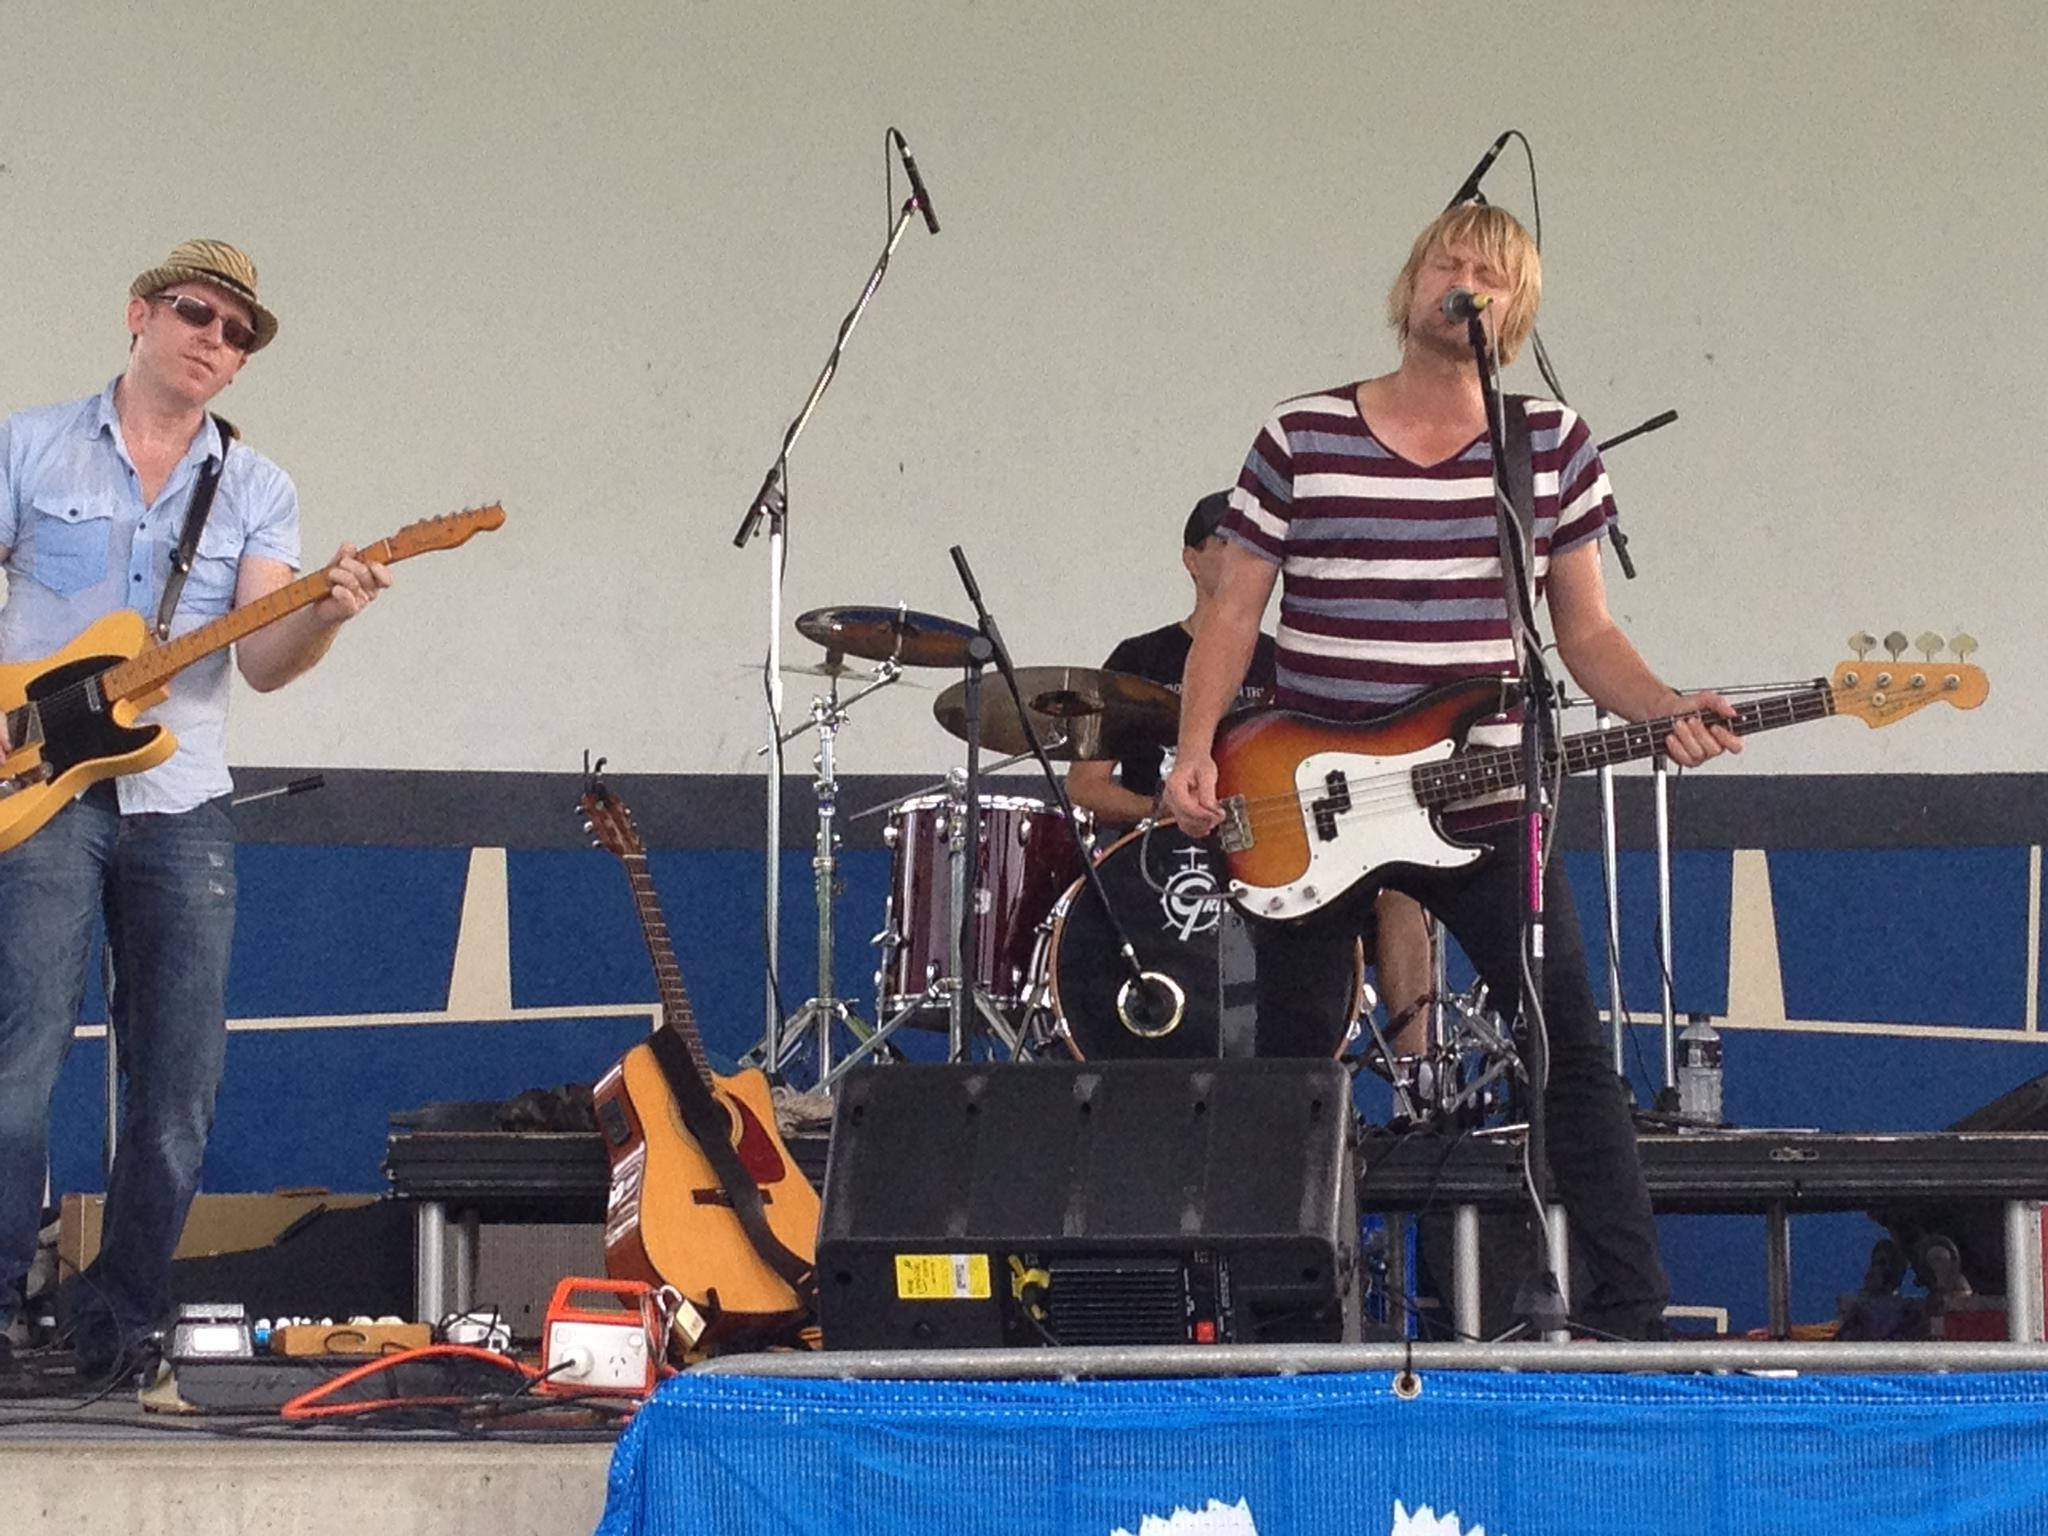 Eddie Skiba band, Fogarty Park, Cairns Esplanade 2012. L-R me, Jason Martin (drums), Eddie Skiba.